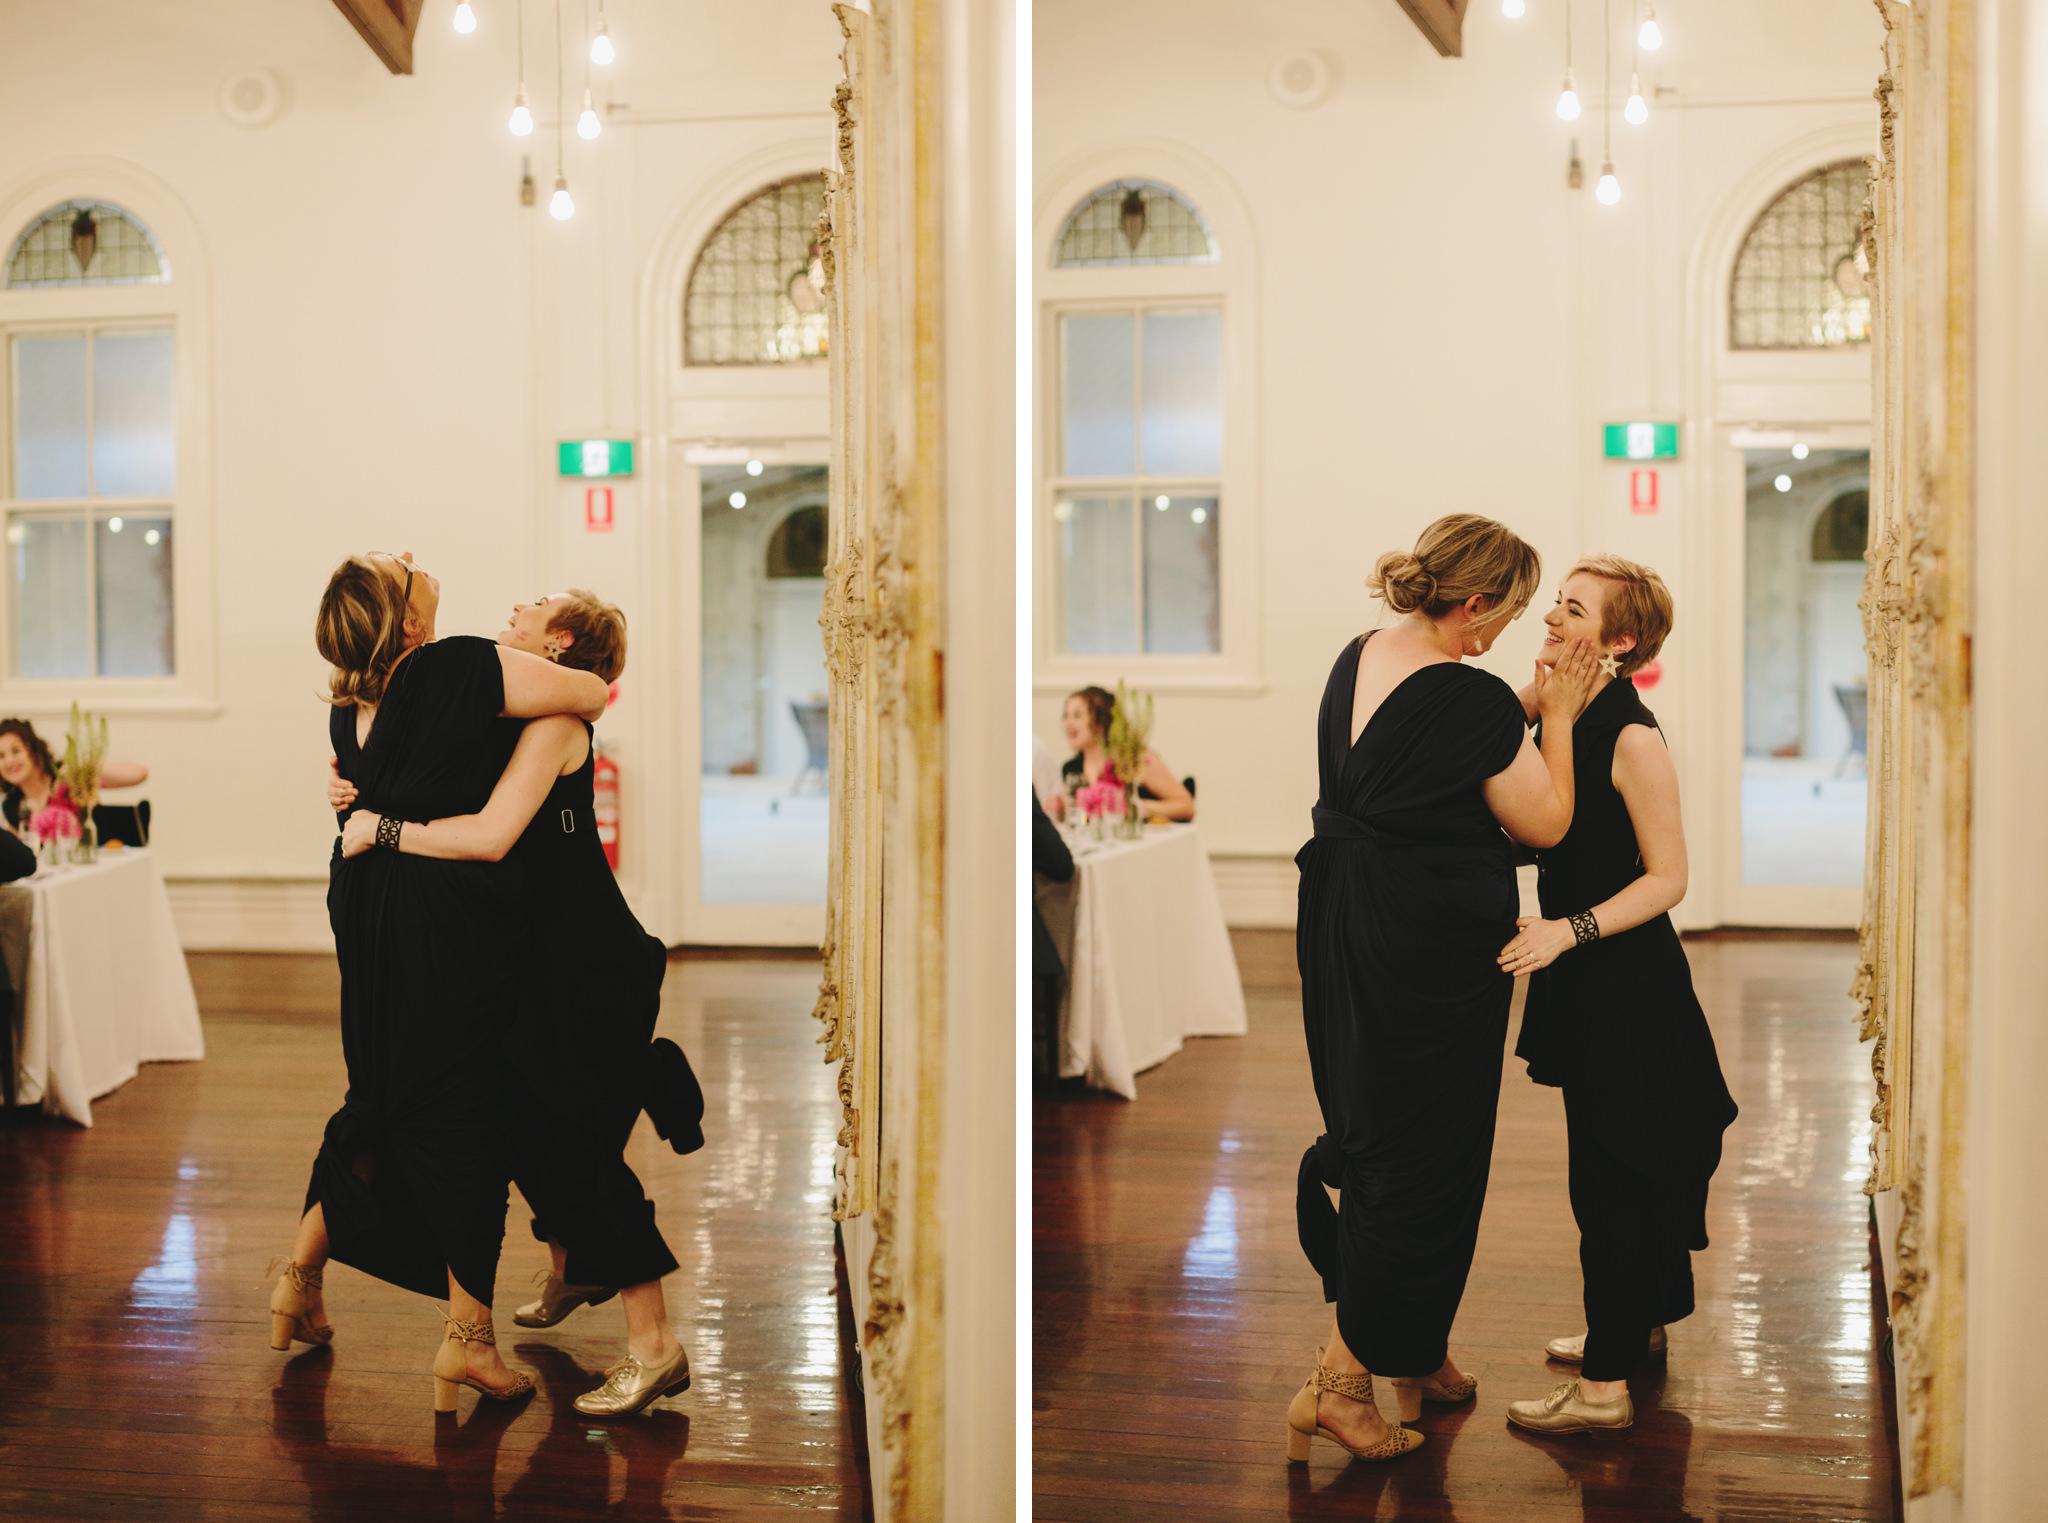 Abbotsford_Convent_Wedding_Peter_Anna103.JPG